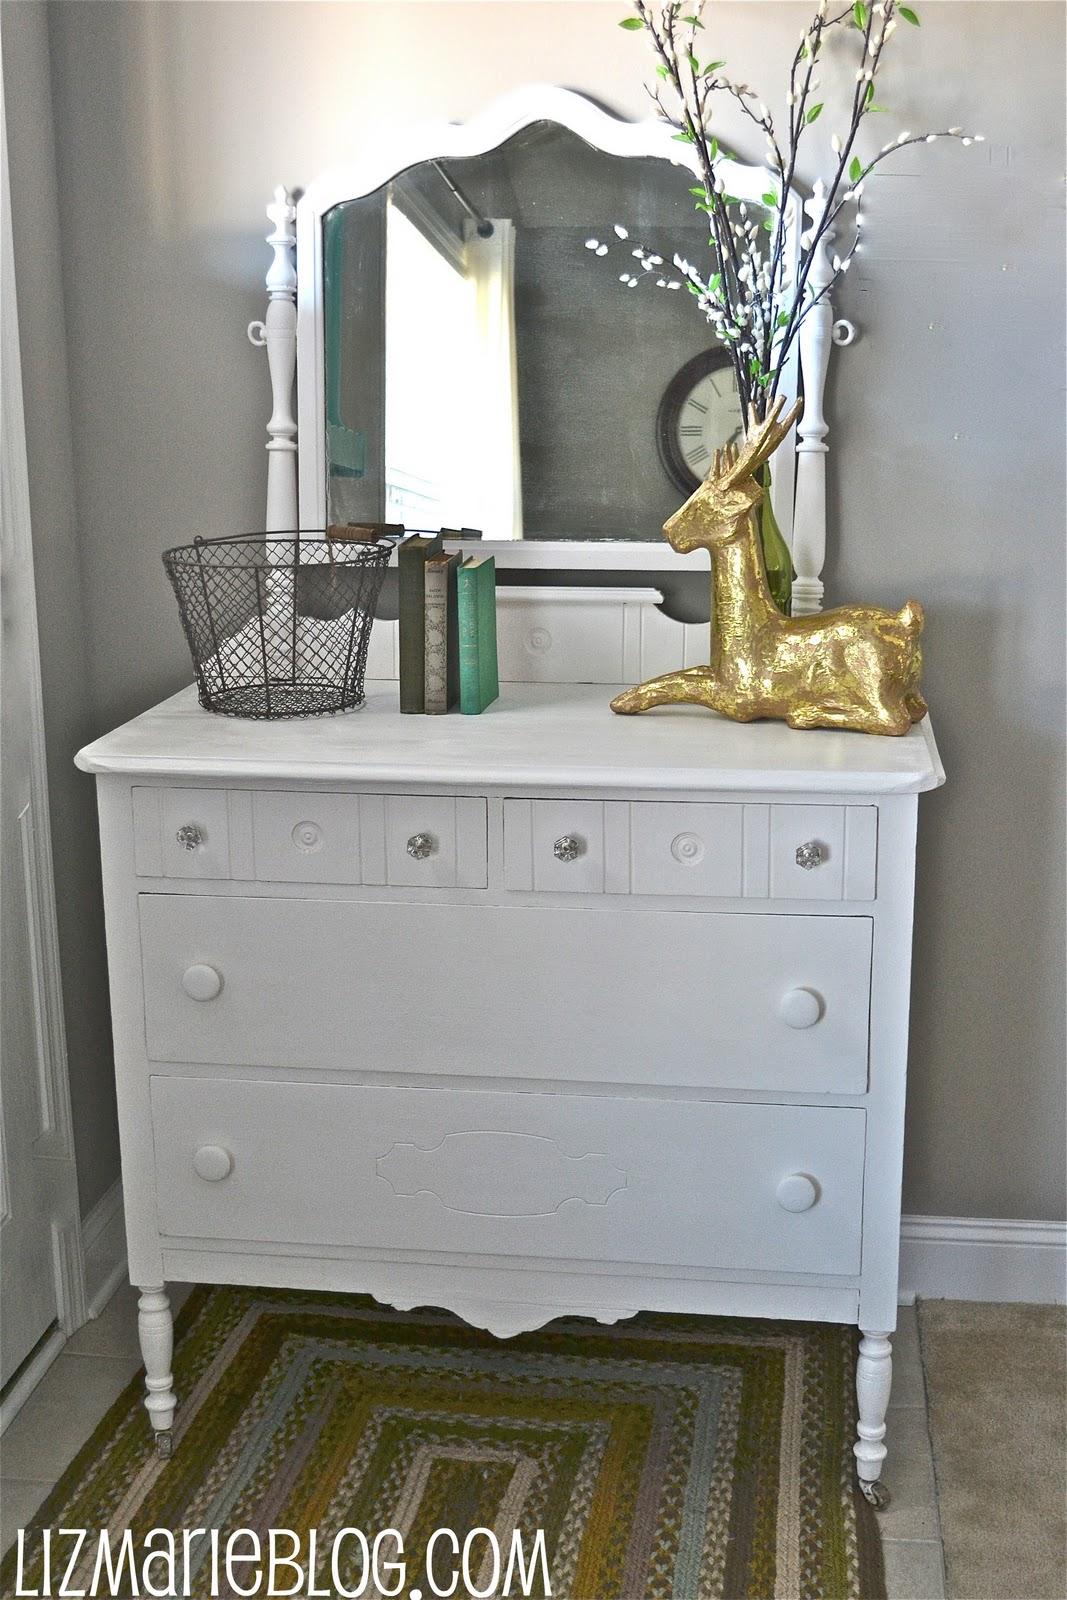 nc wood furniture paint. Nc Wood Furniture Paint